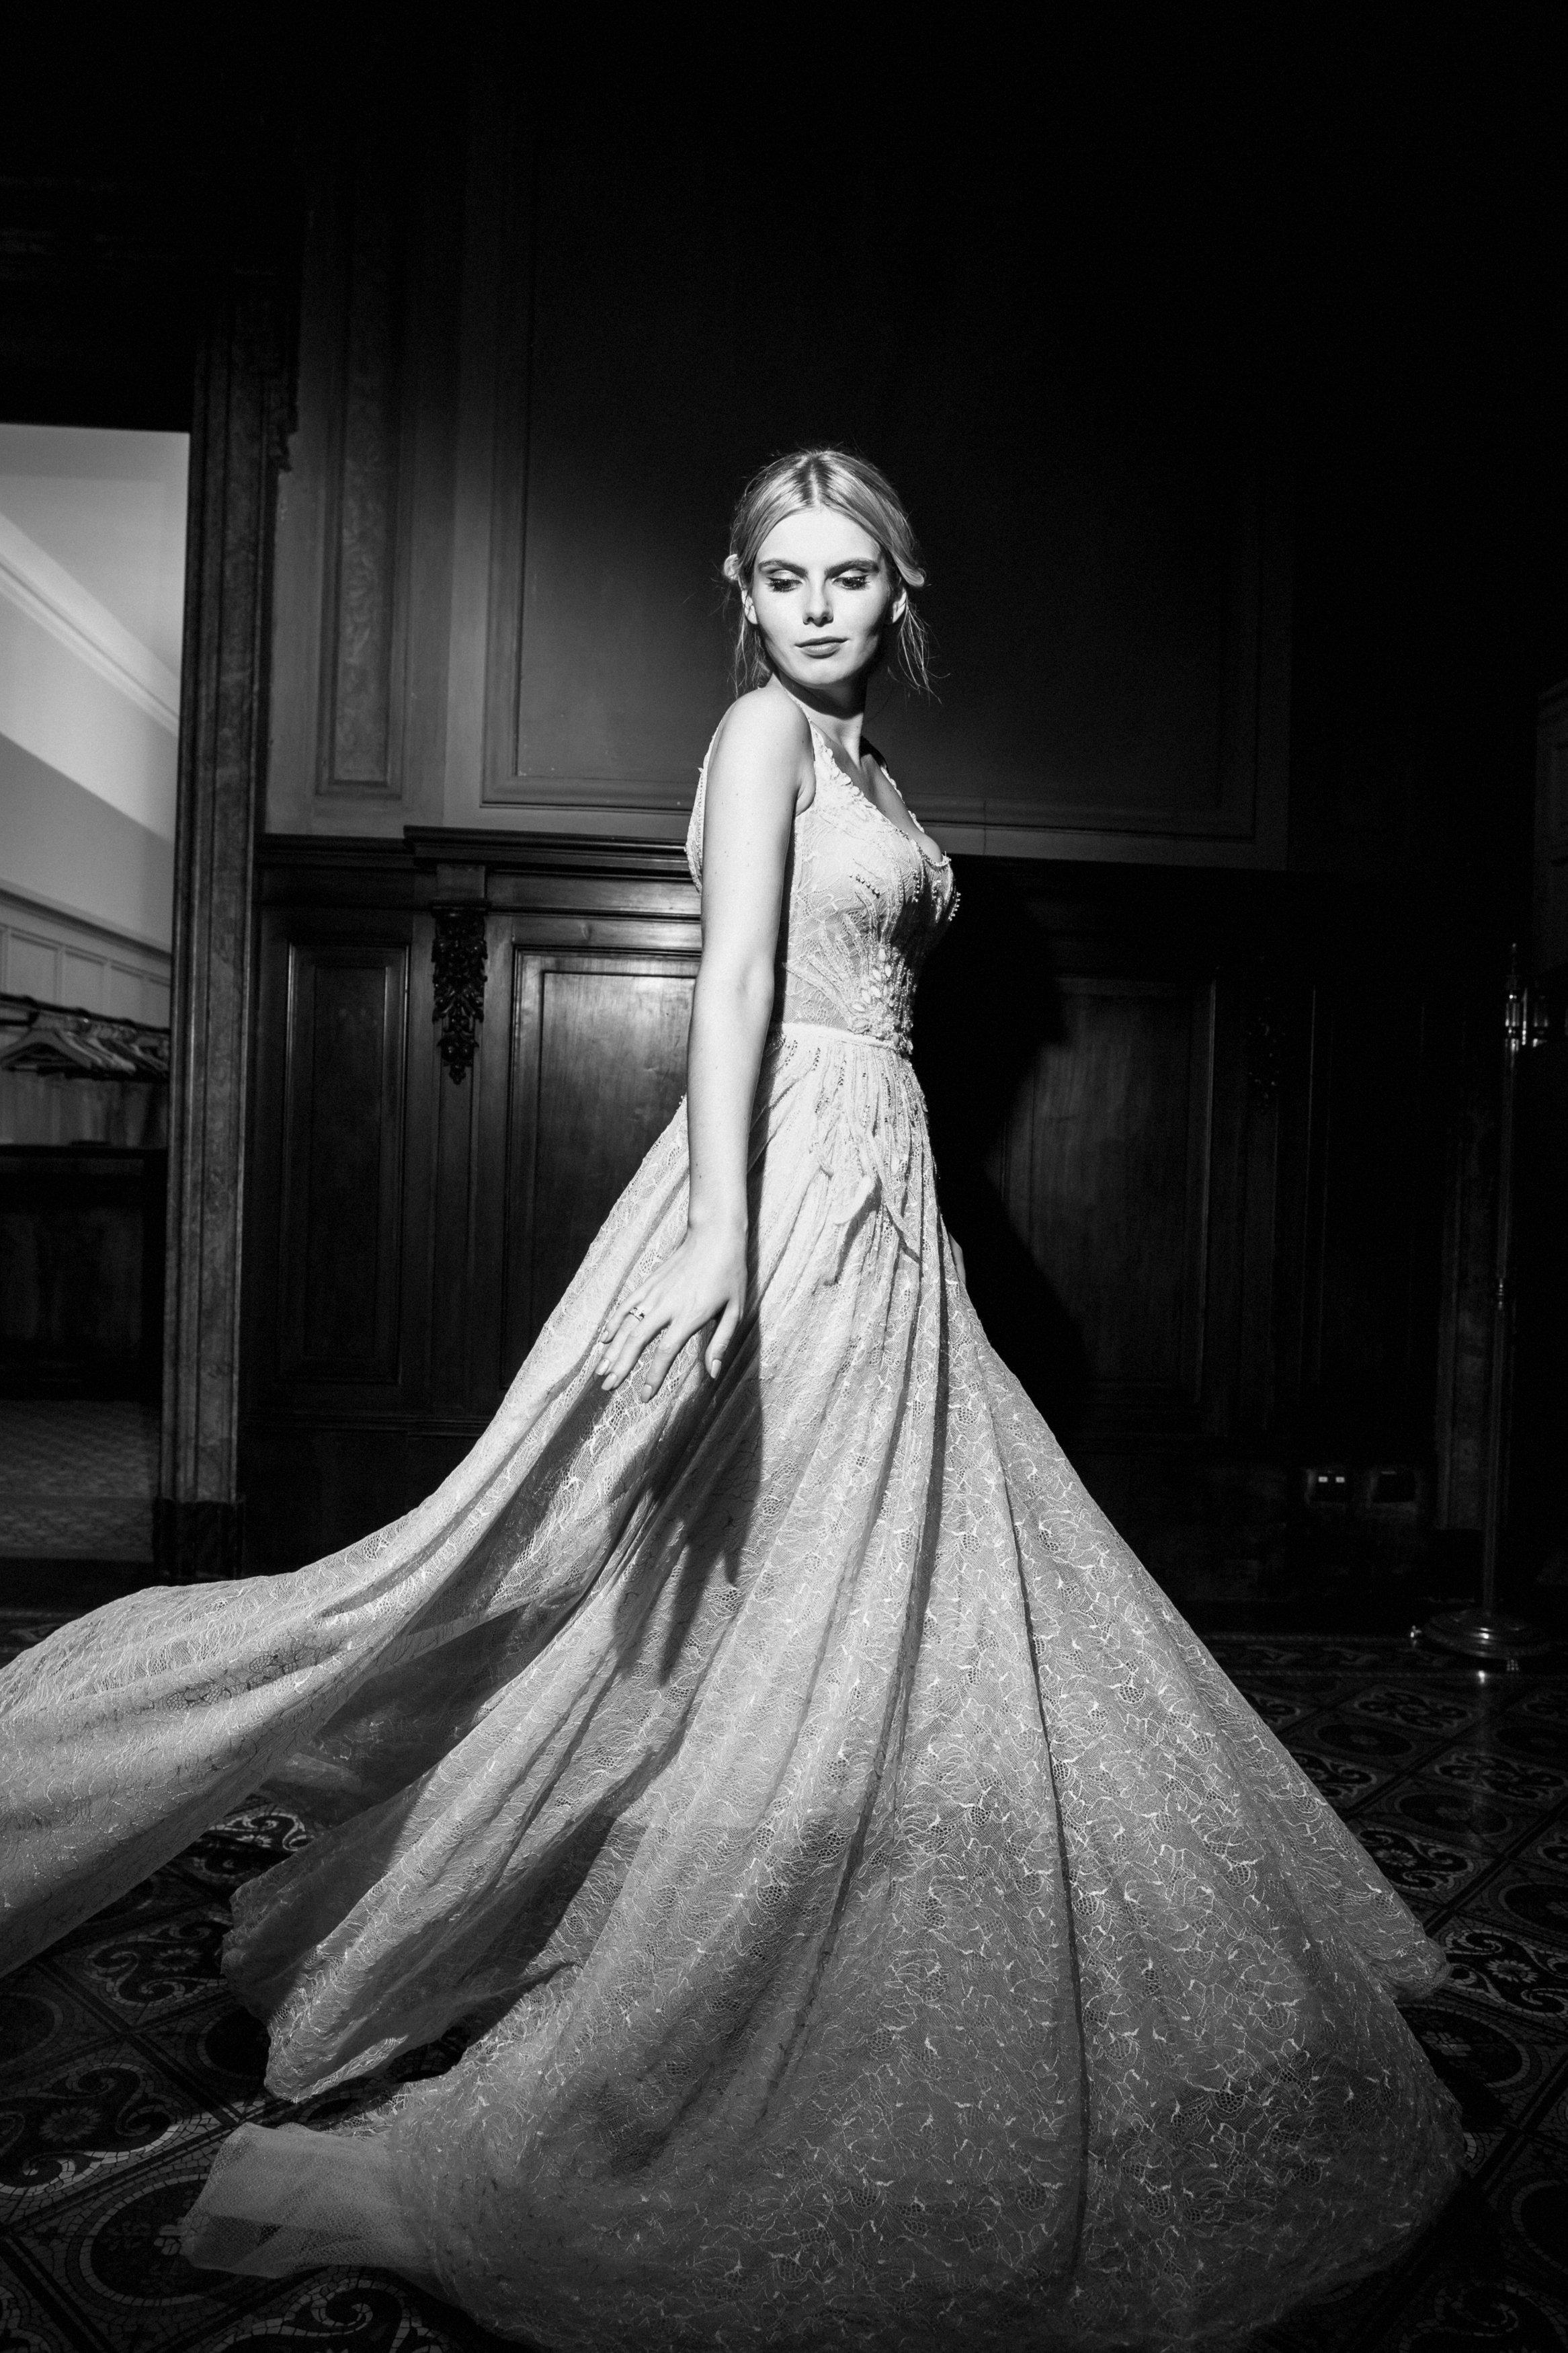 Karolina Vitaly September 03 2017 Como Italy-BEST-0102.jpg